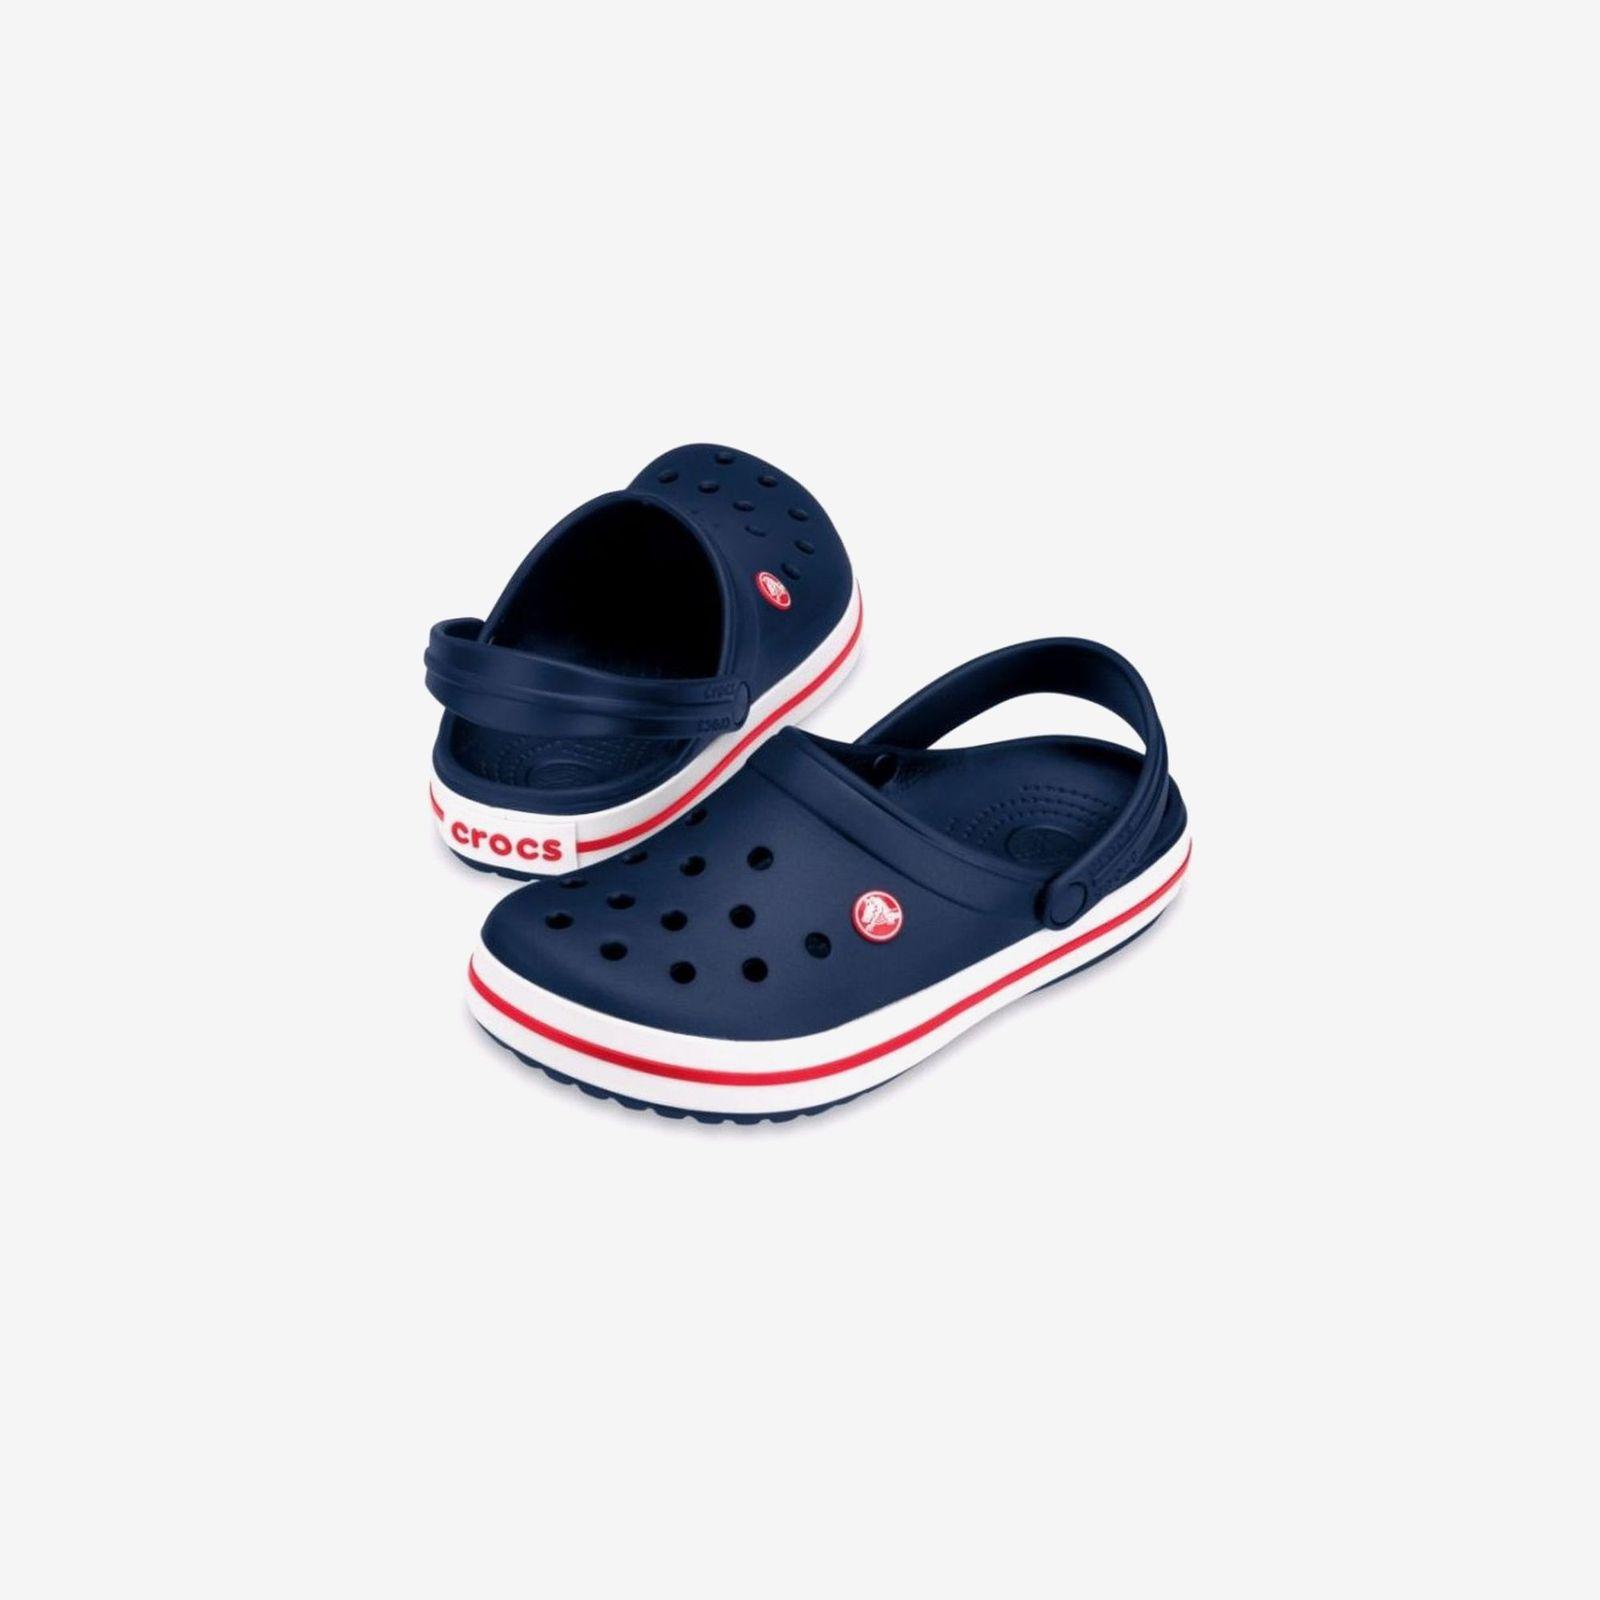 Сабо детские Crocs Crocband Kids